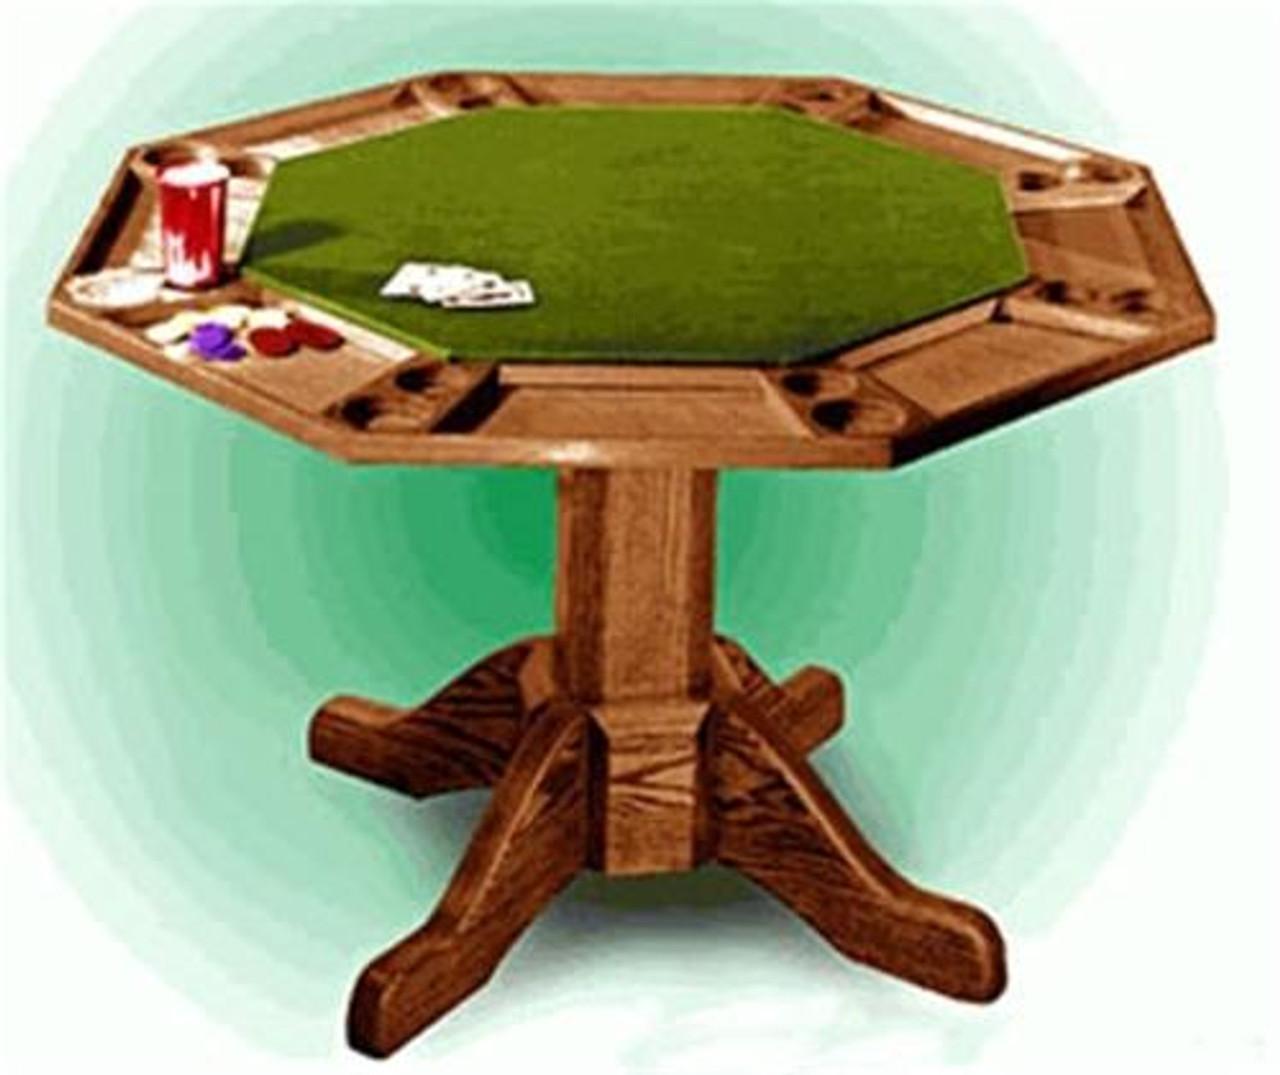 Cherry Tree Toys Poker of Game Table Plan